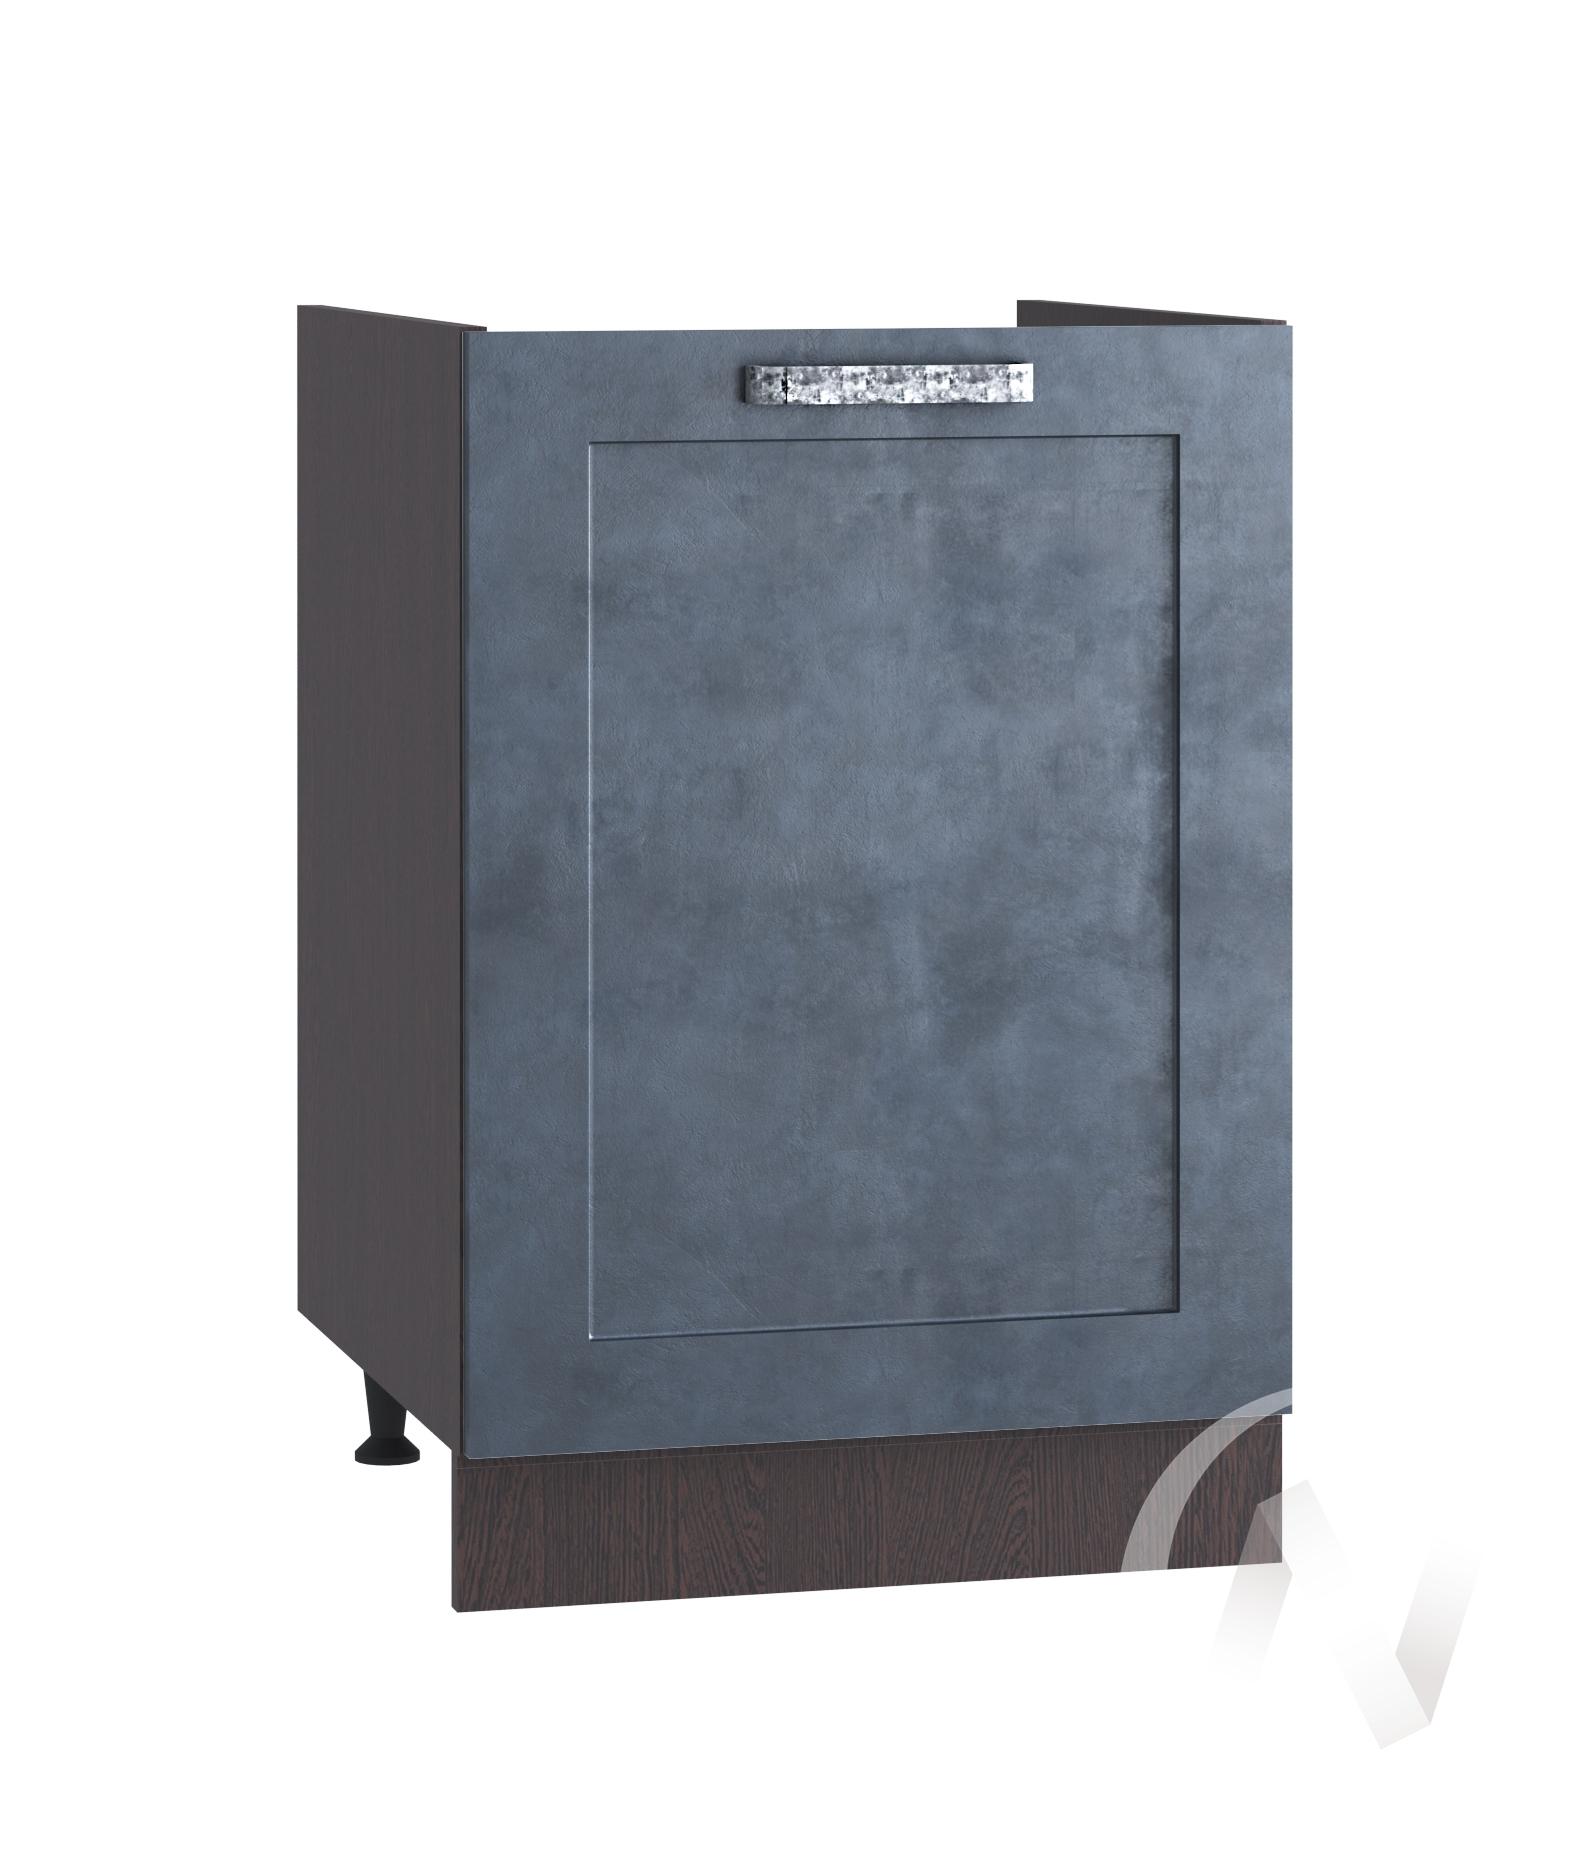 "Кухня ""Лофт"": Шкаф нижний под мойку 500, ШНМ 500 (Бетон графит/корпус венге)"